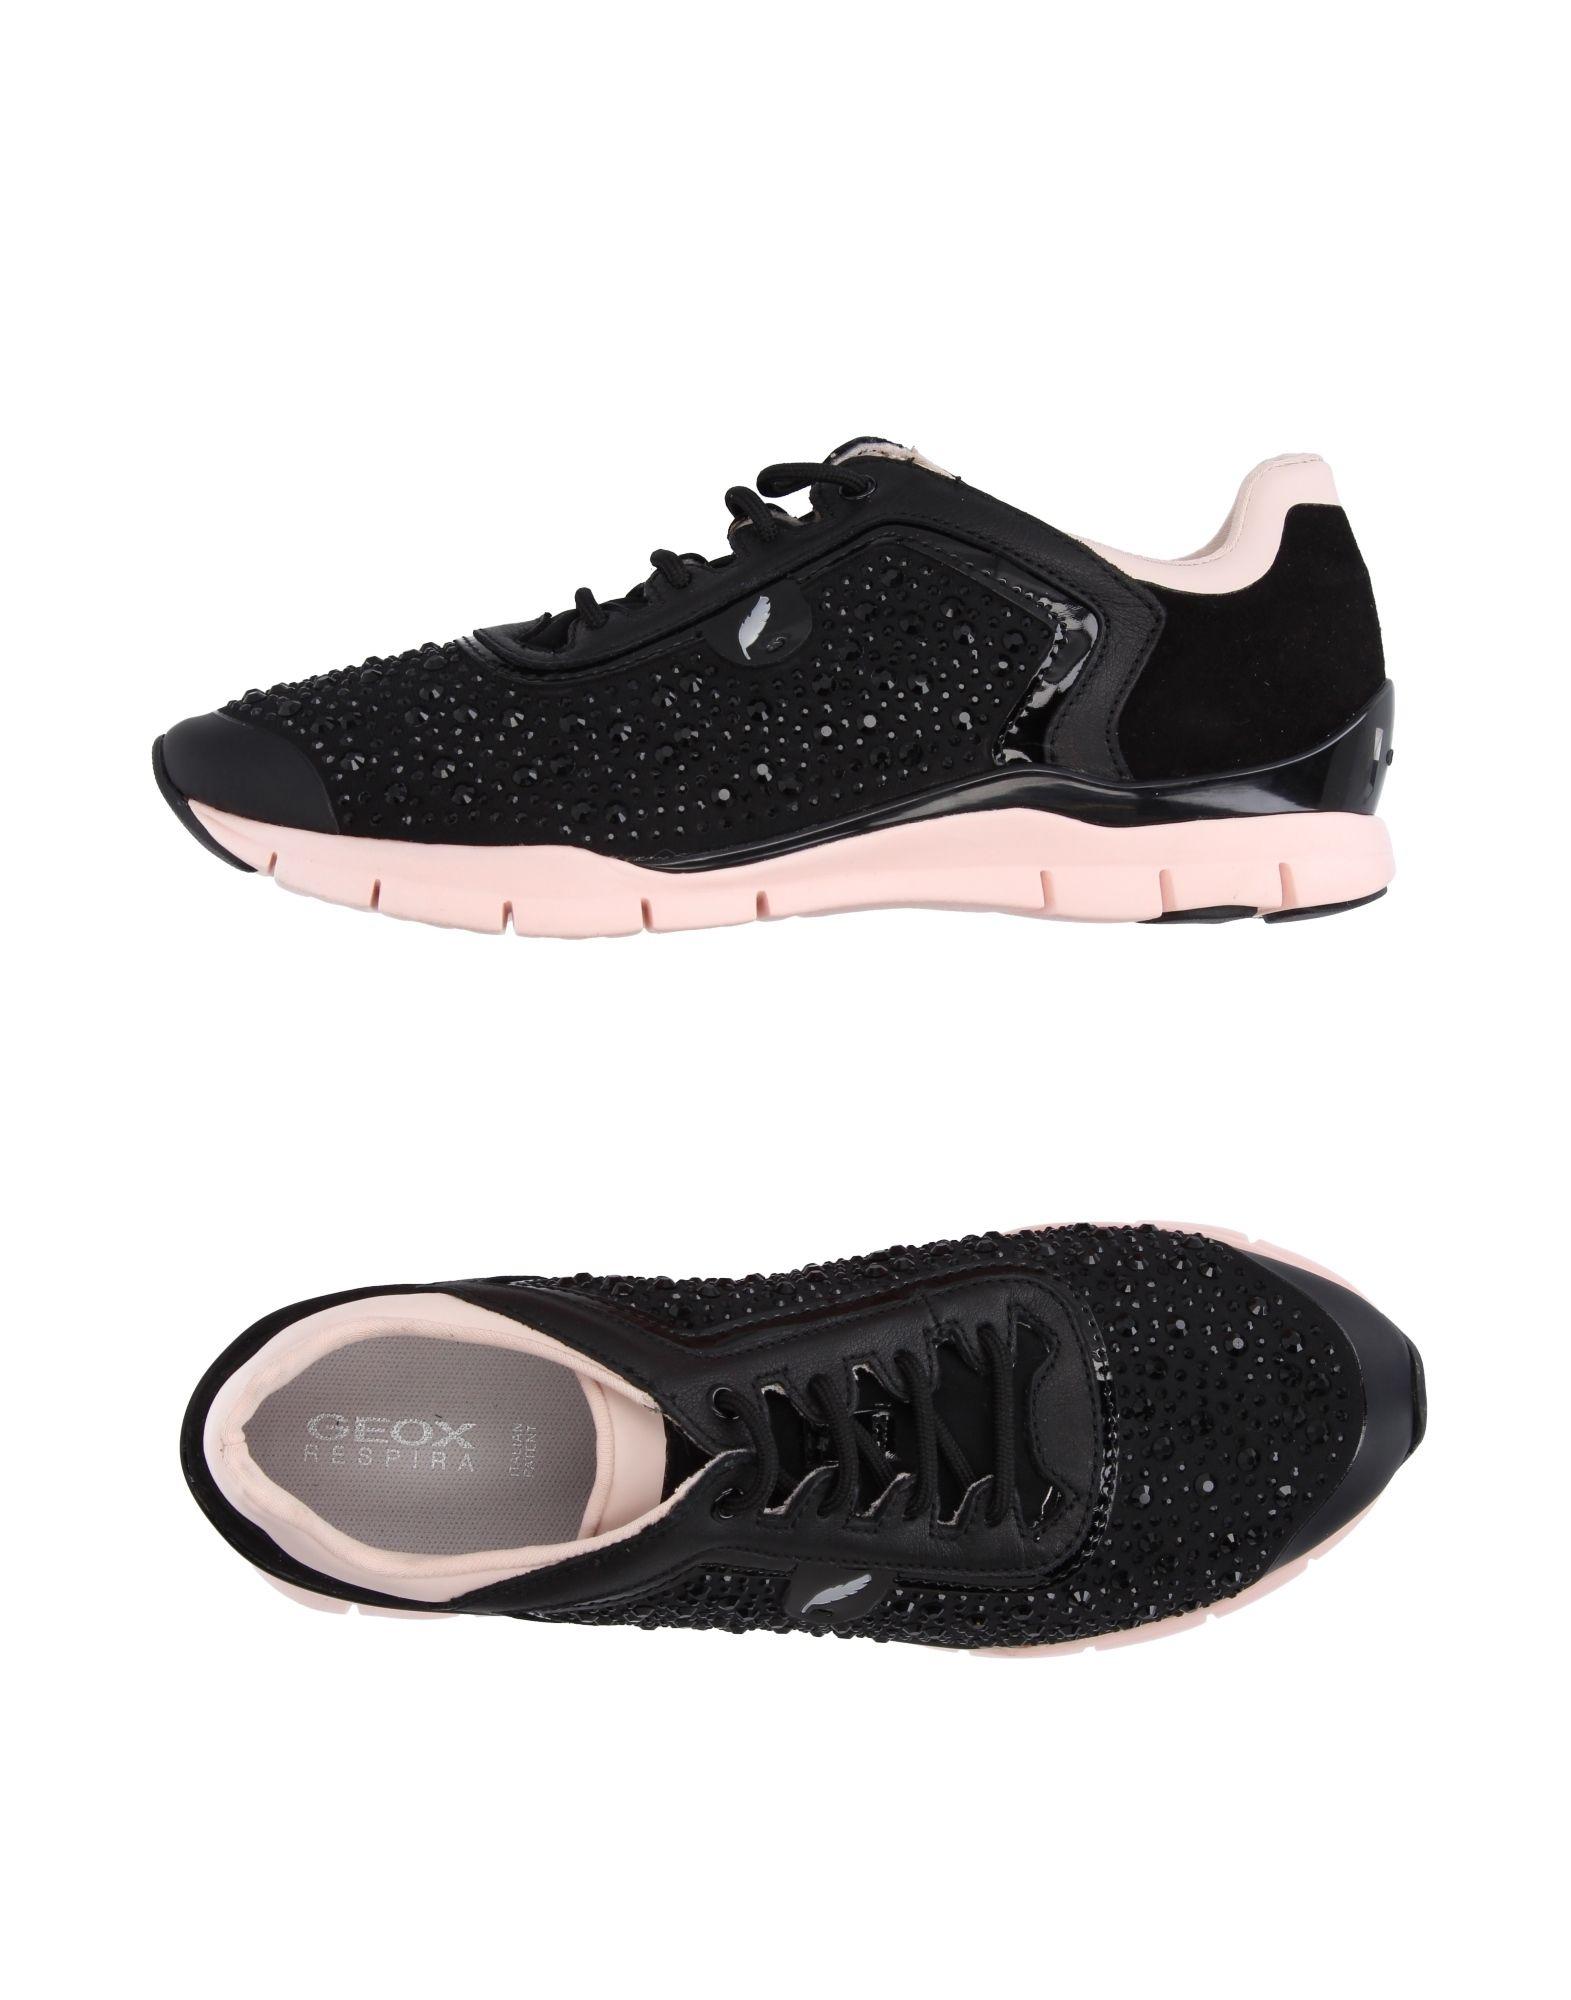 Geox Gute Sneakers Damen  11216976GX Gute Geox Qualität beliebte Schuhe 22ed3e